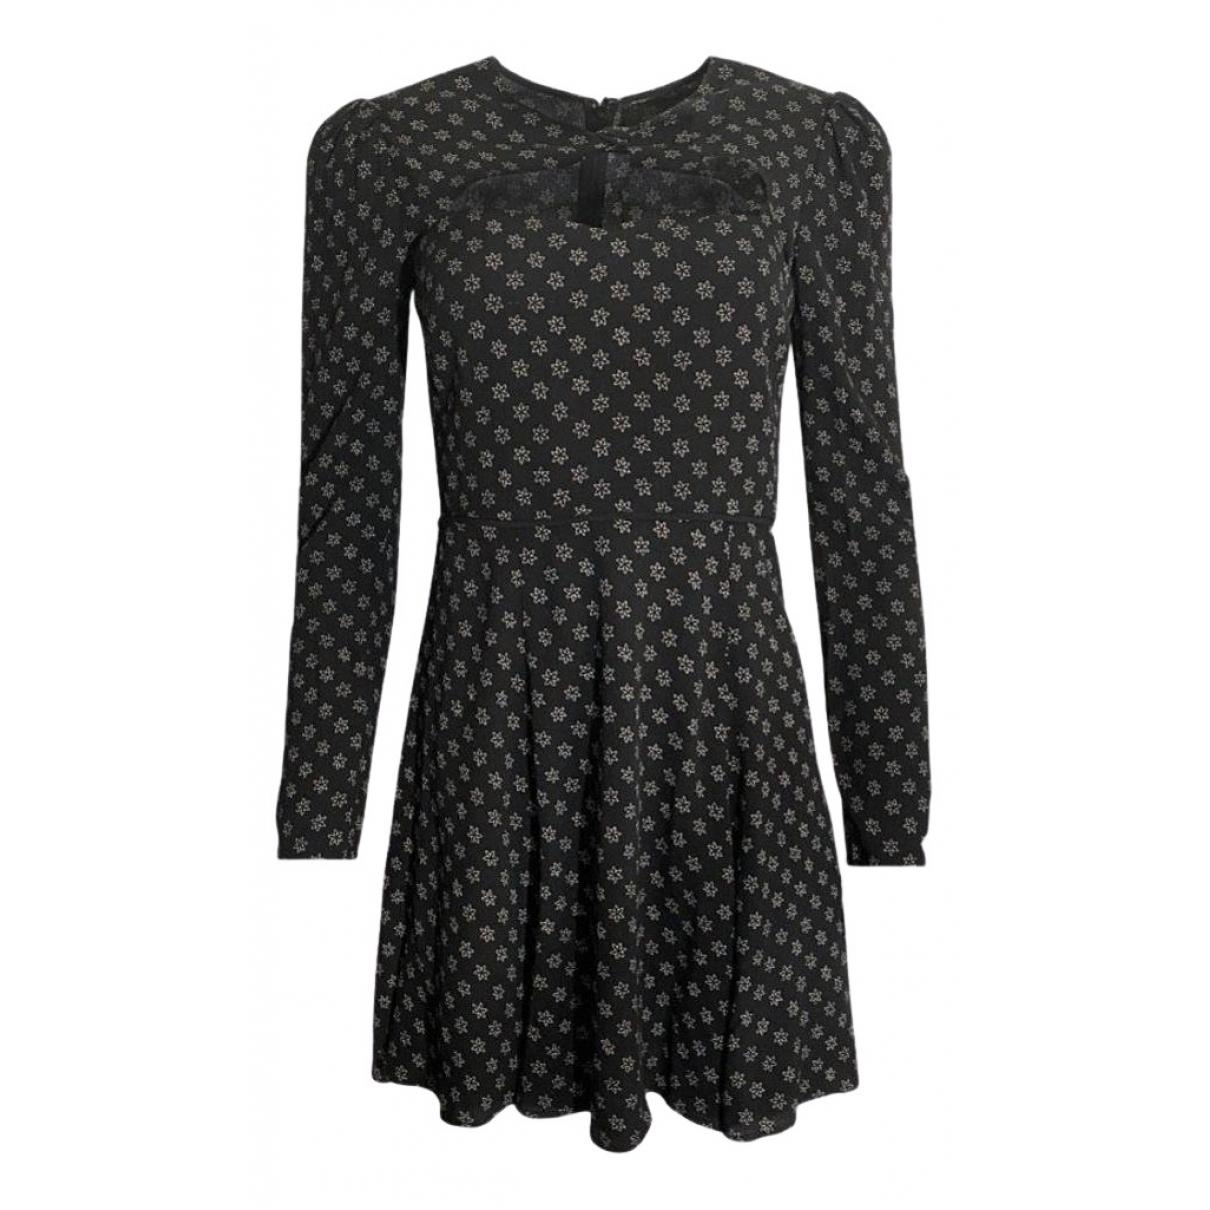 Reformation \N Black dress for Women 6 US